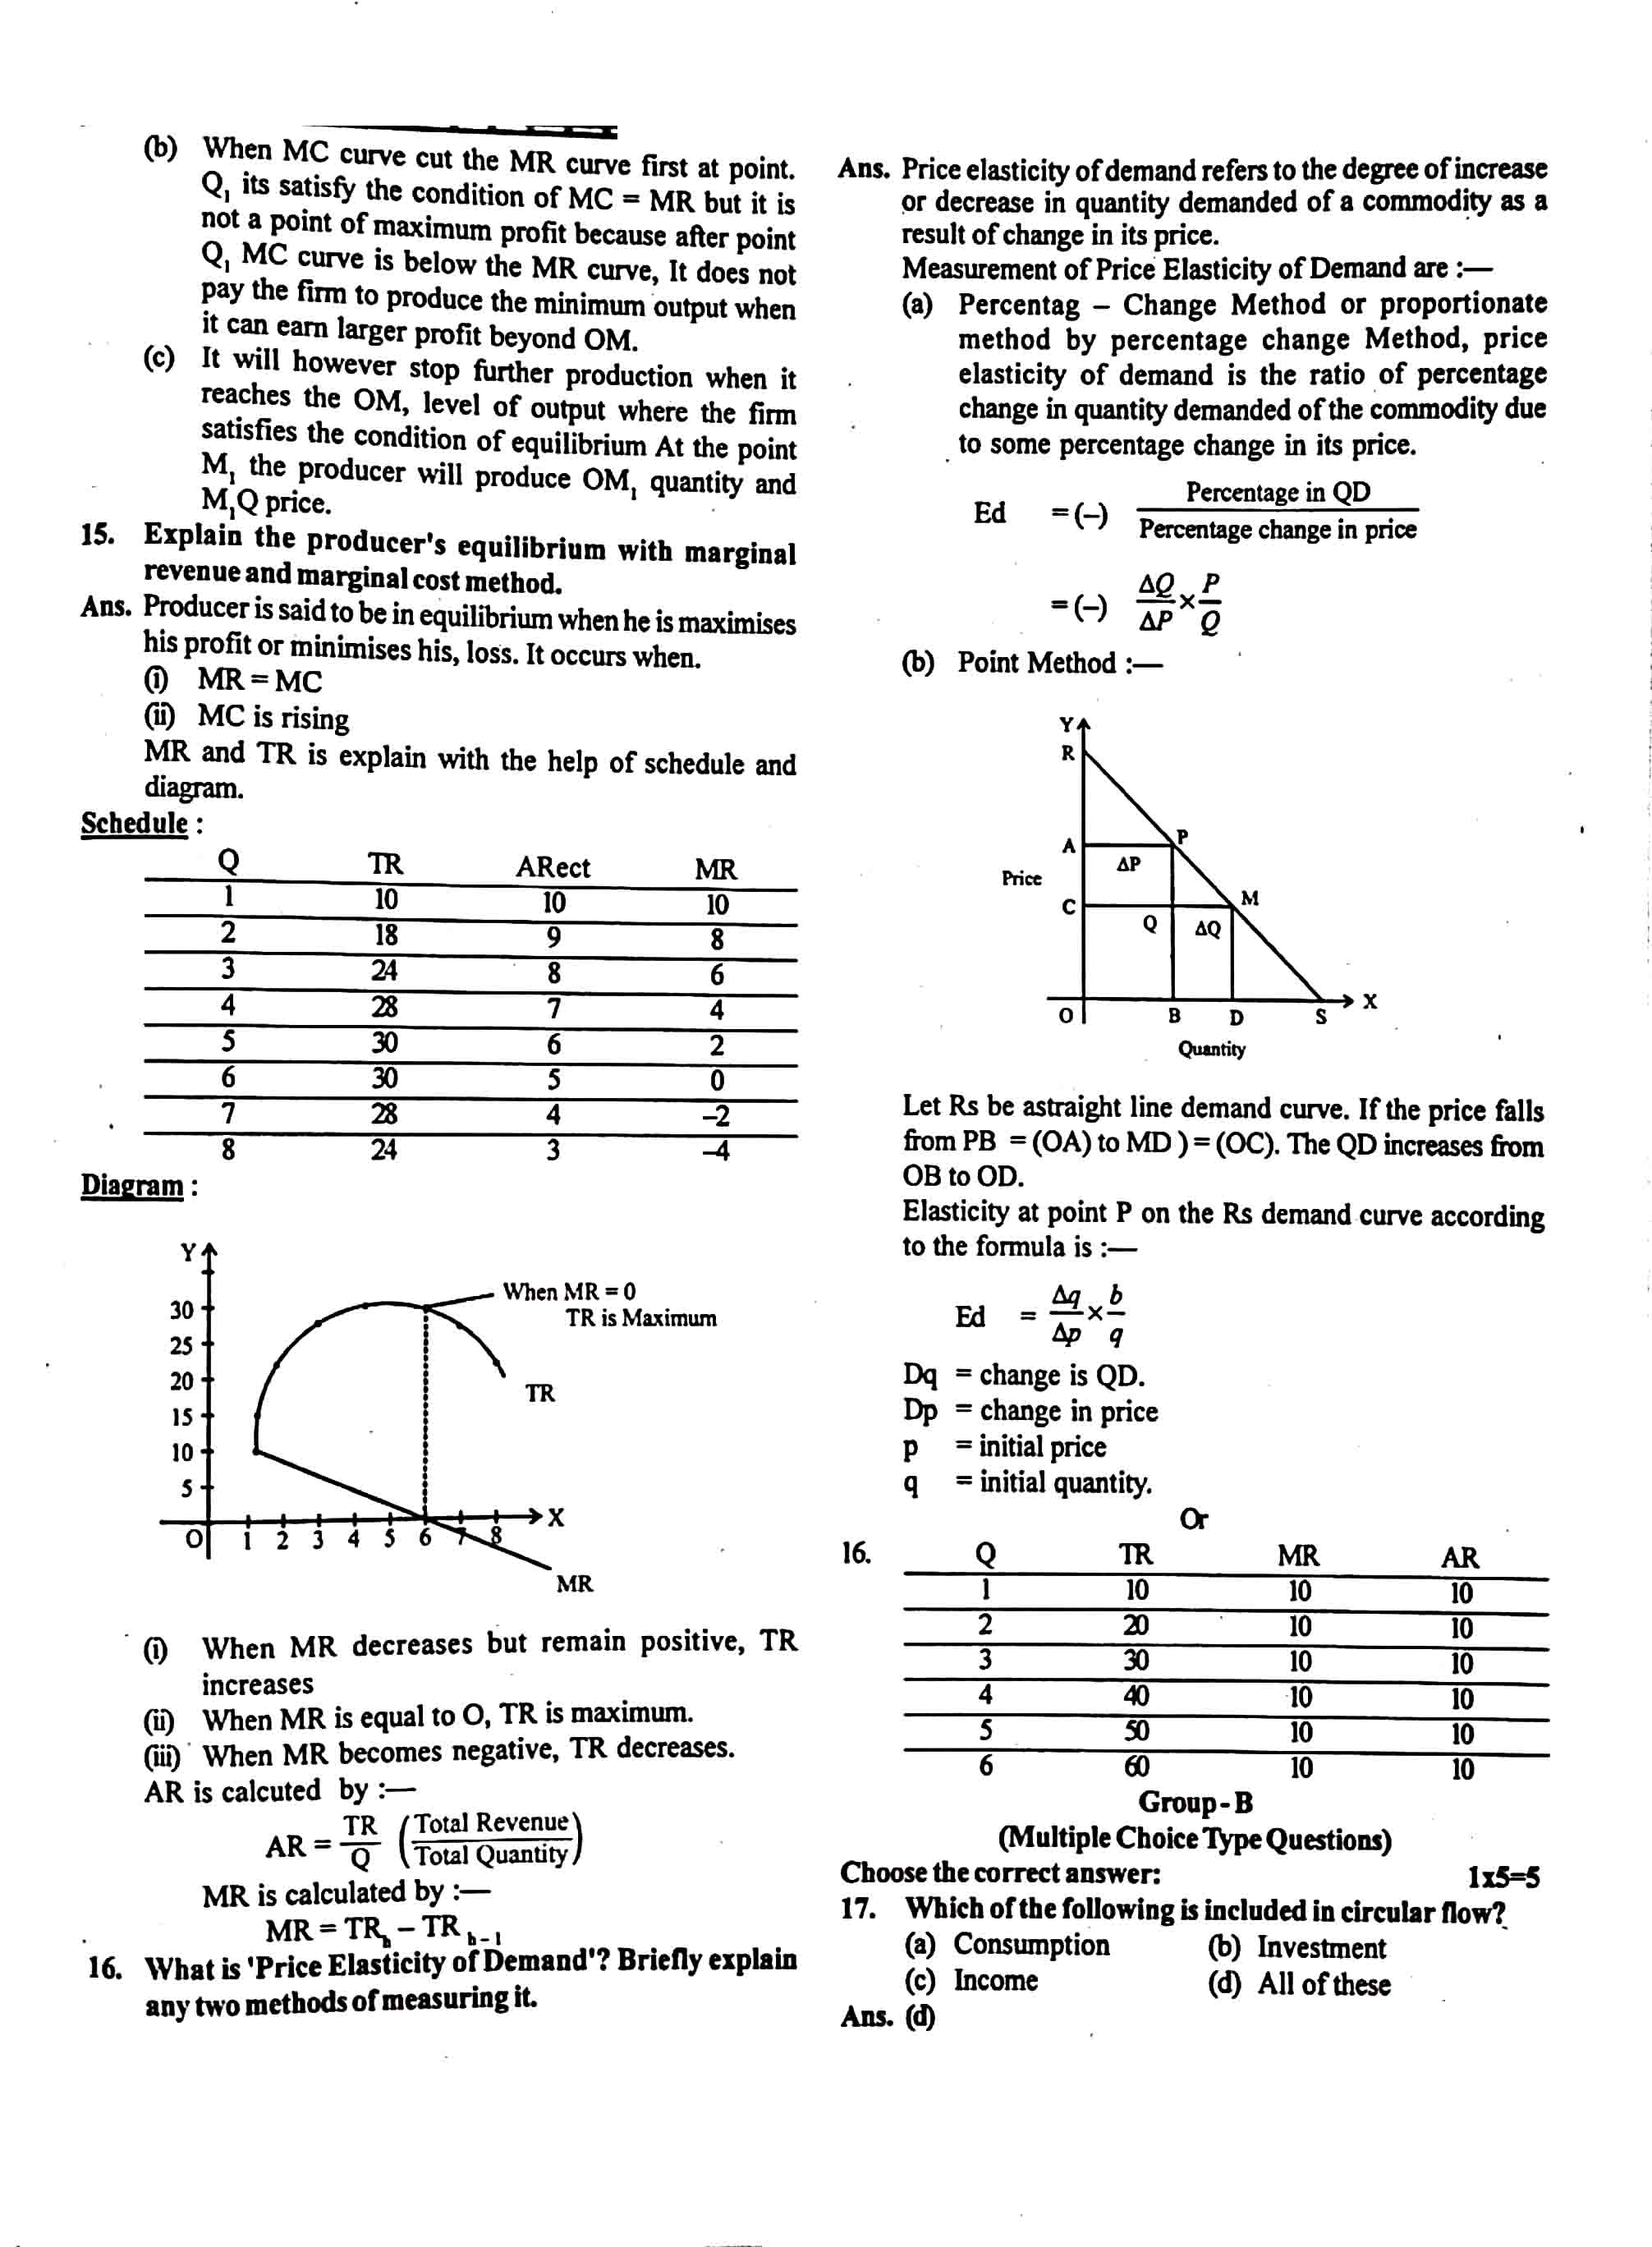 JAC Class 12 economics 2019 Question Paper 03